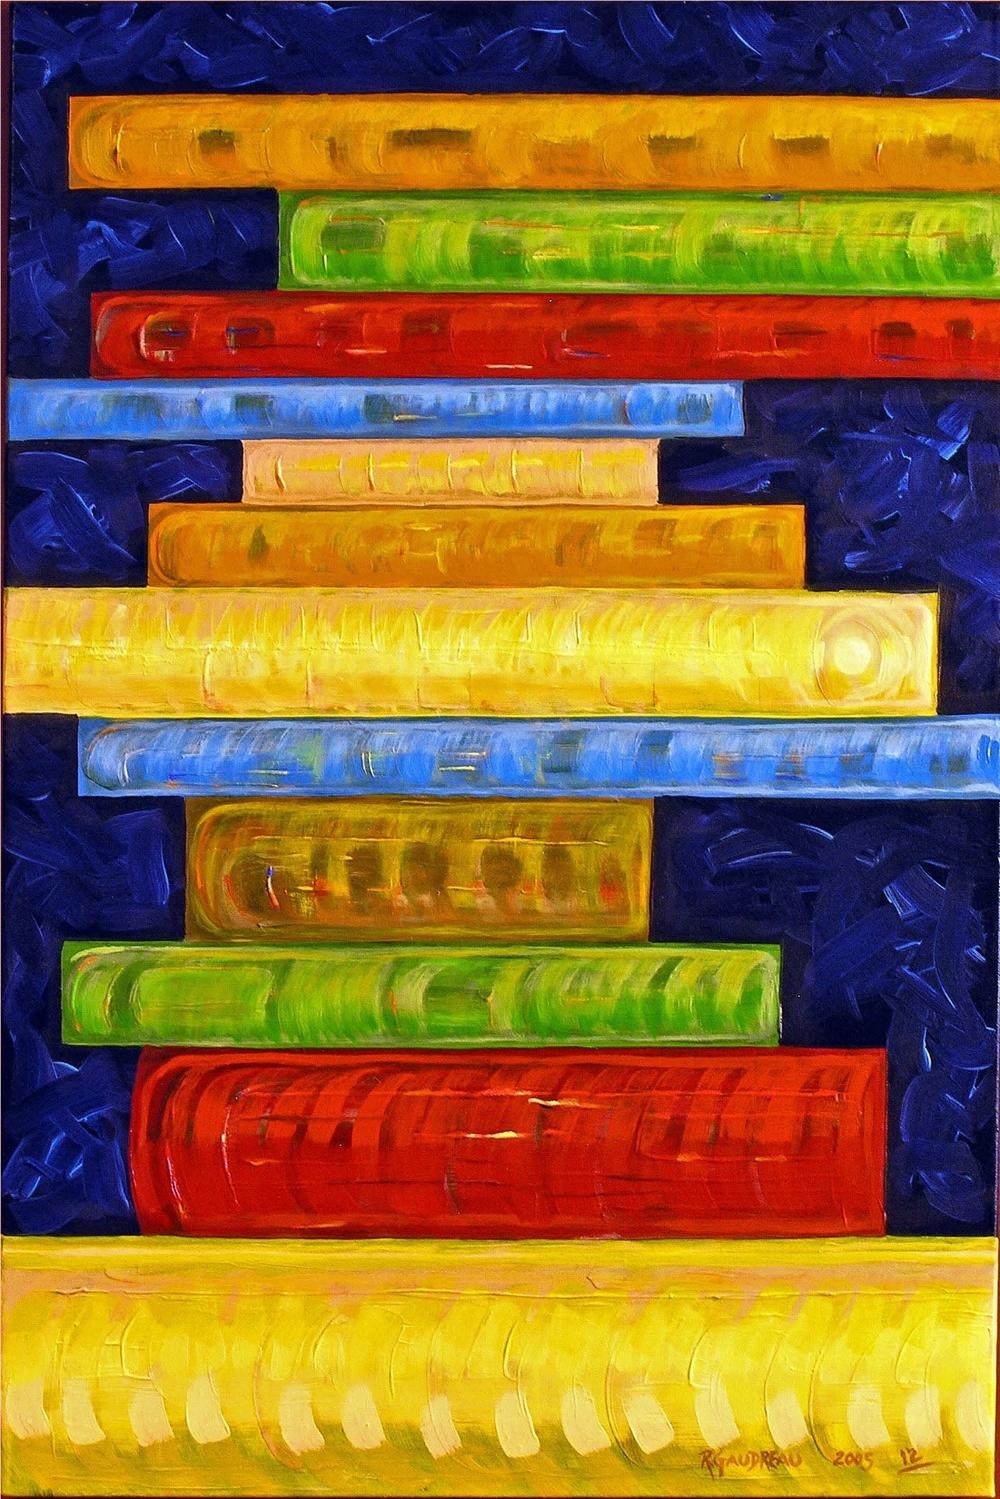 1250 12 Books Max pxl MasterJPG.jpg